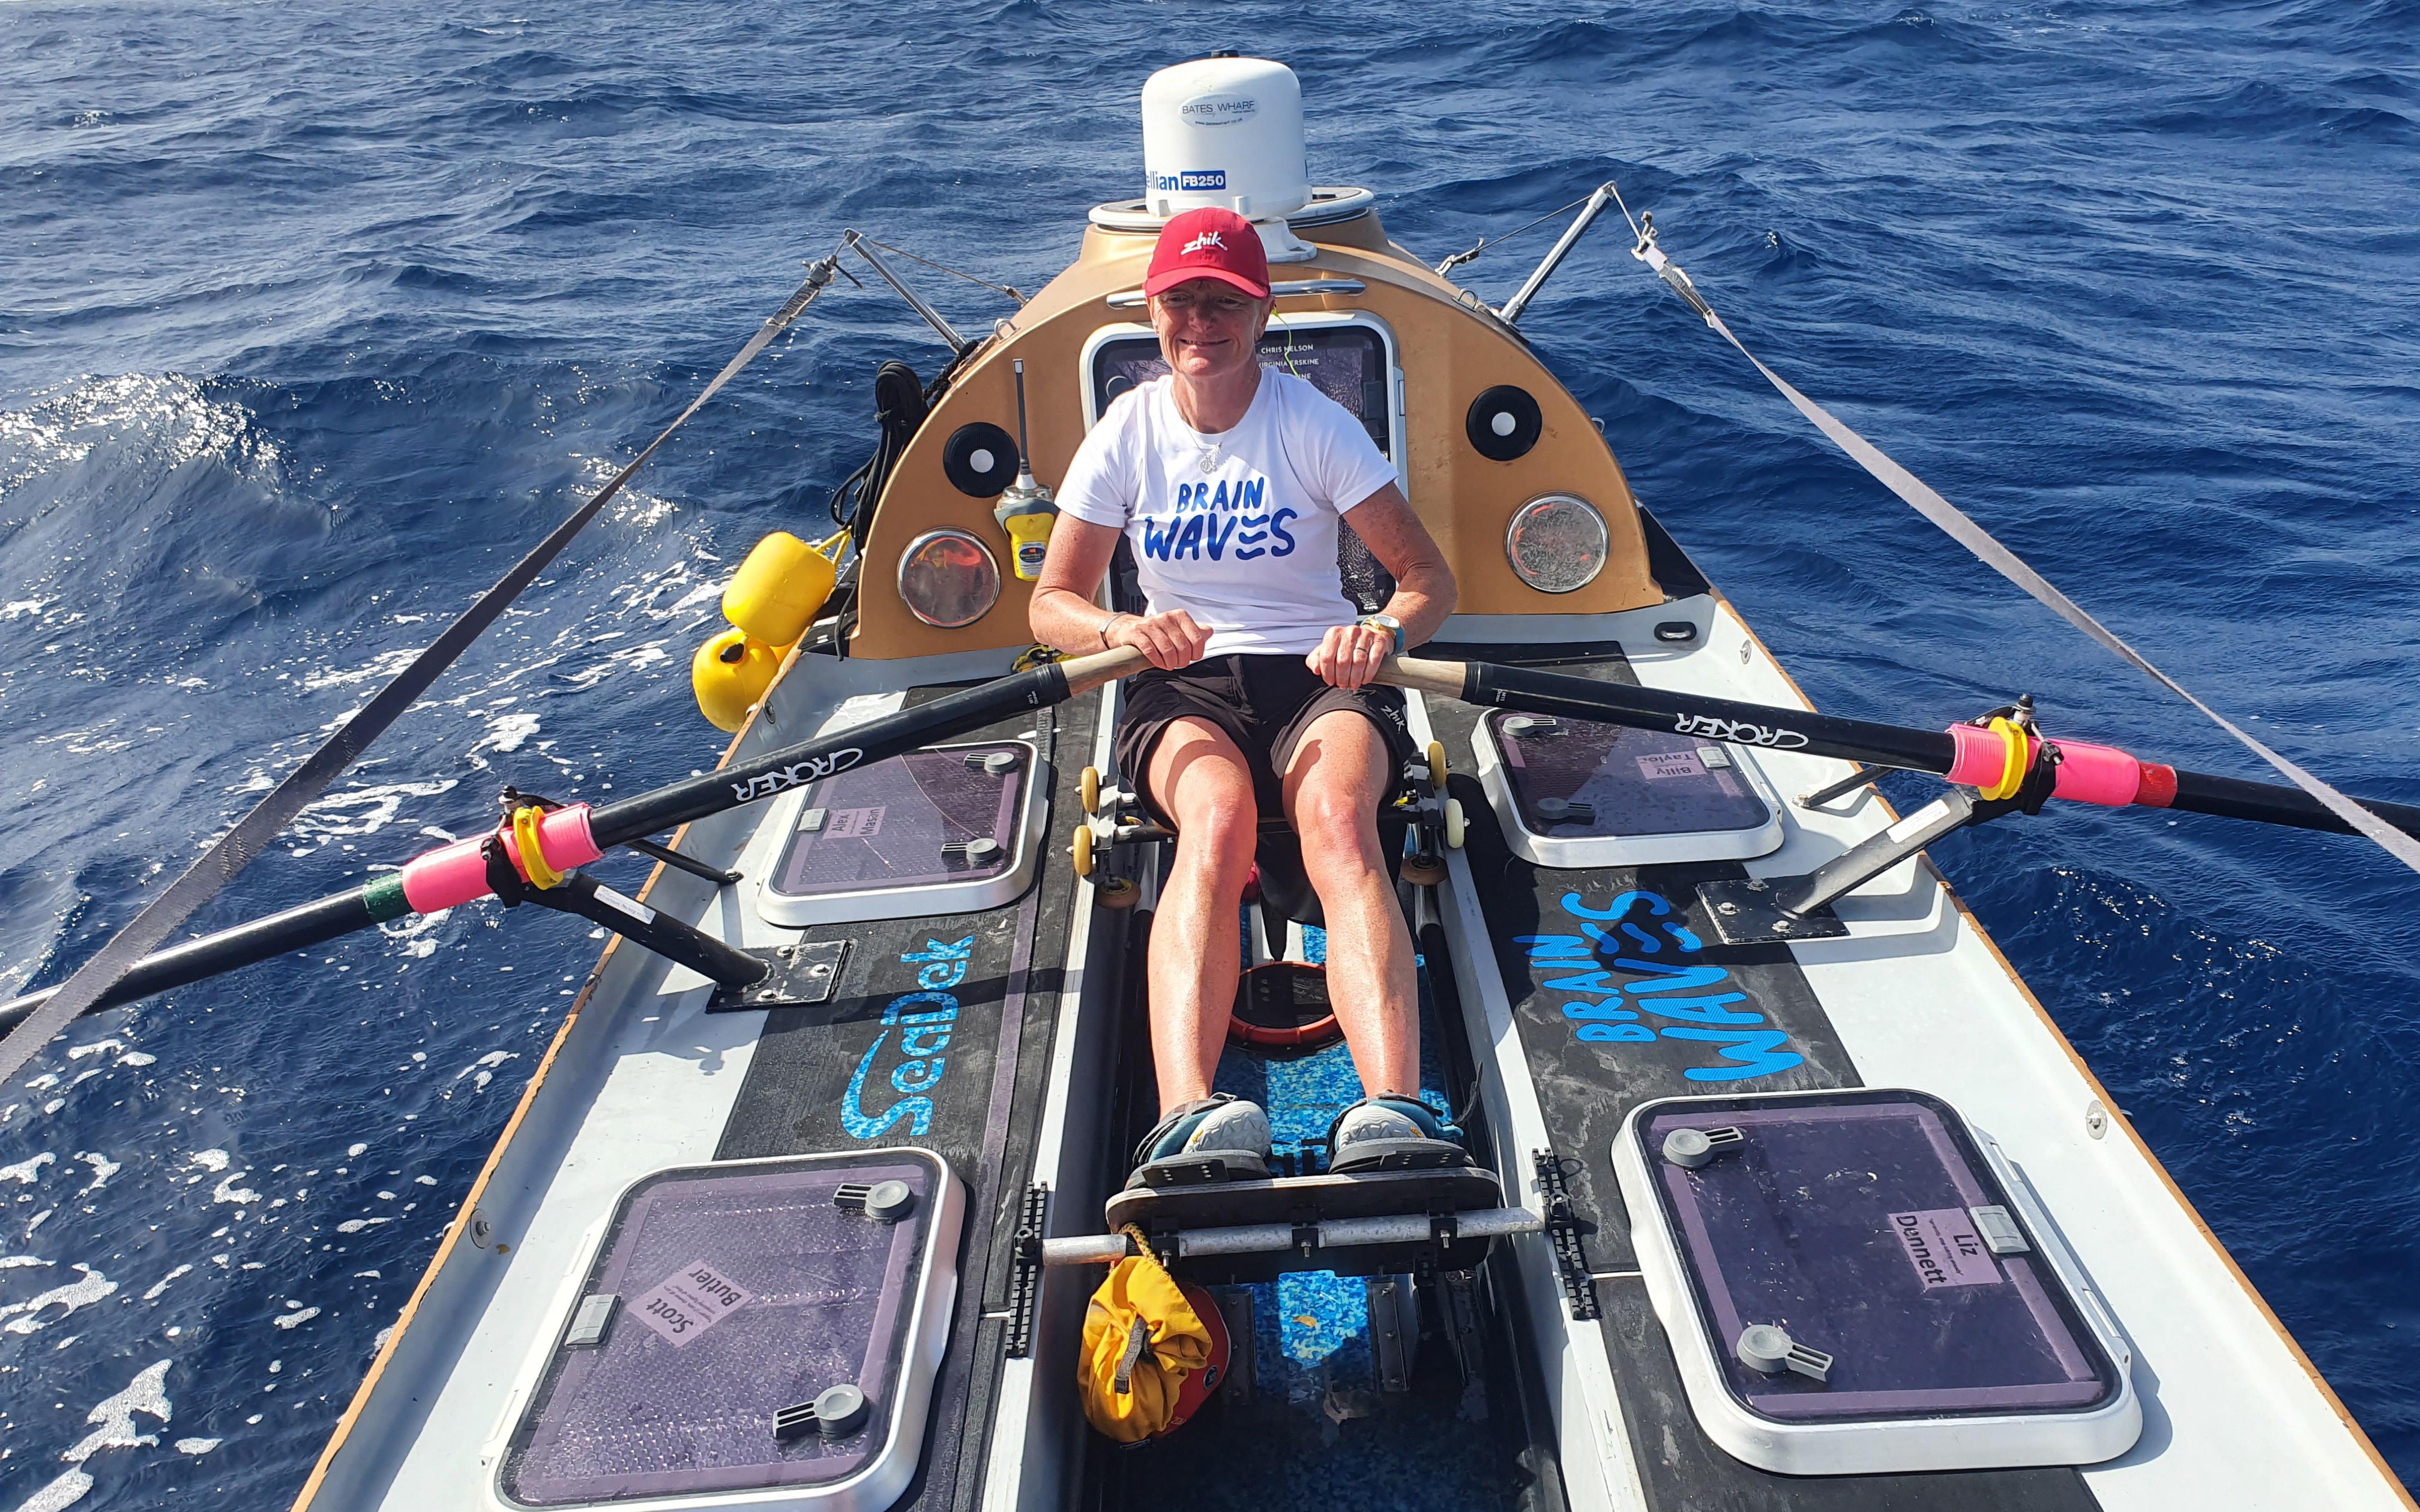 Liz Dennett rowing in the ocean